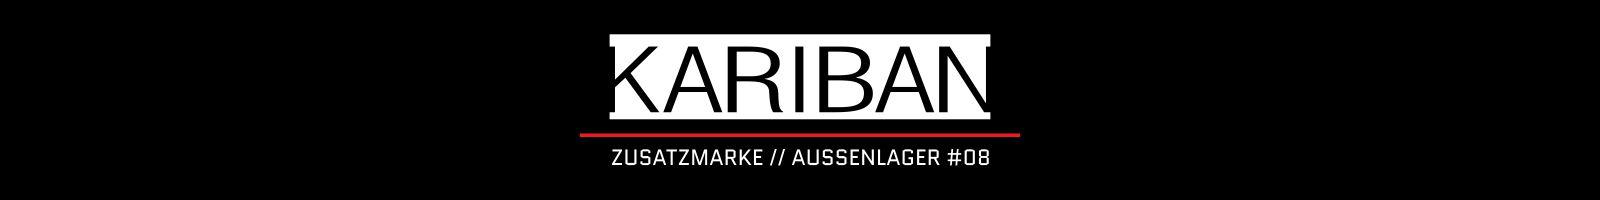 Kategorie-Marken => Kariban